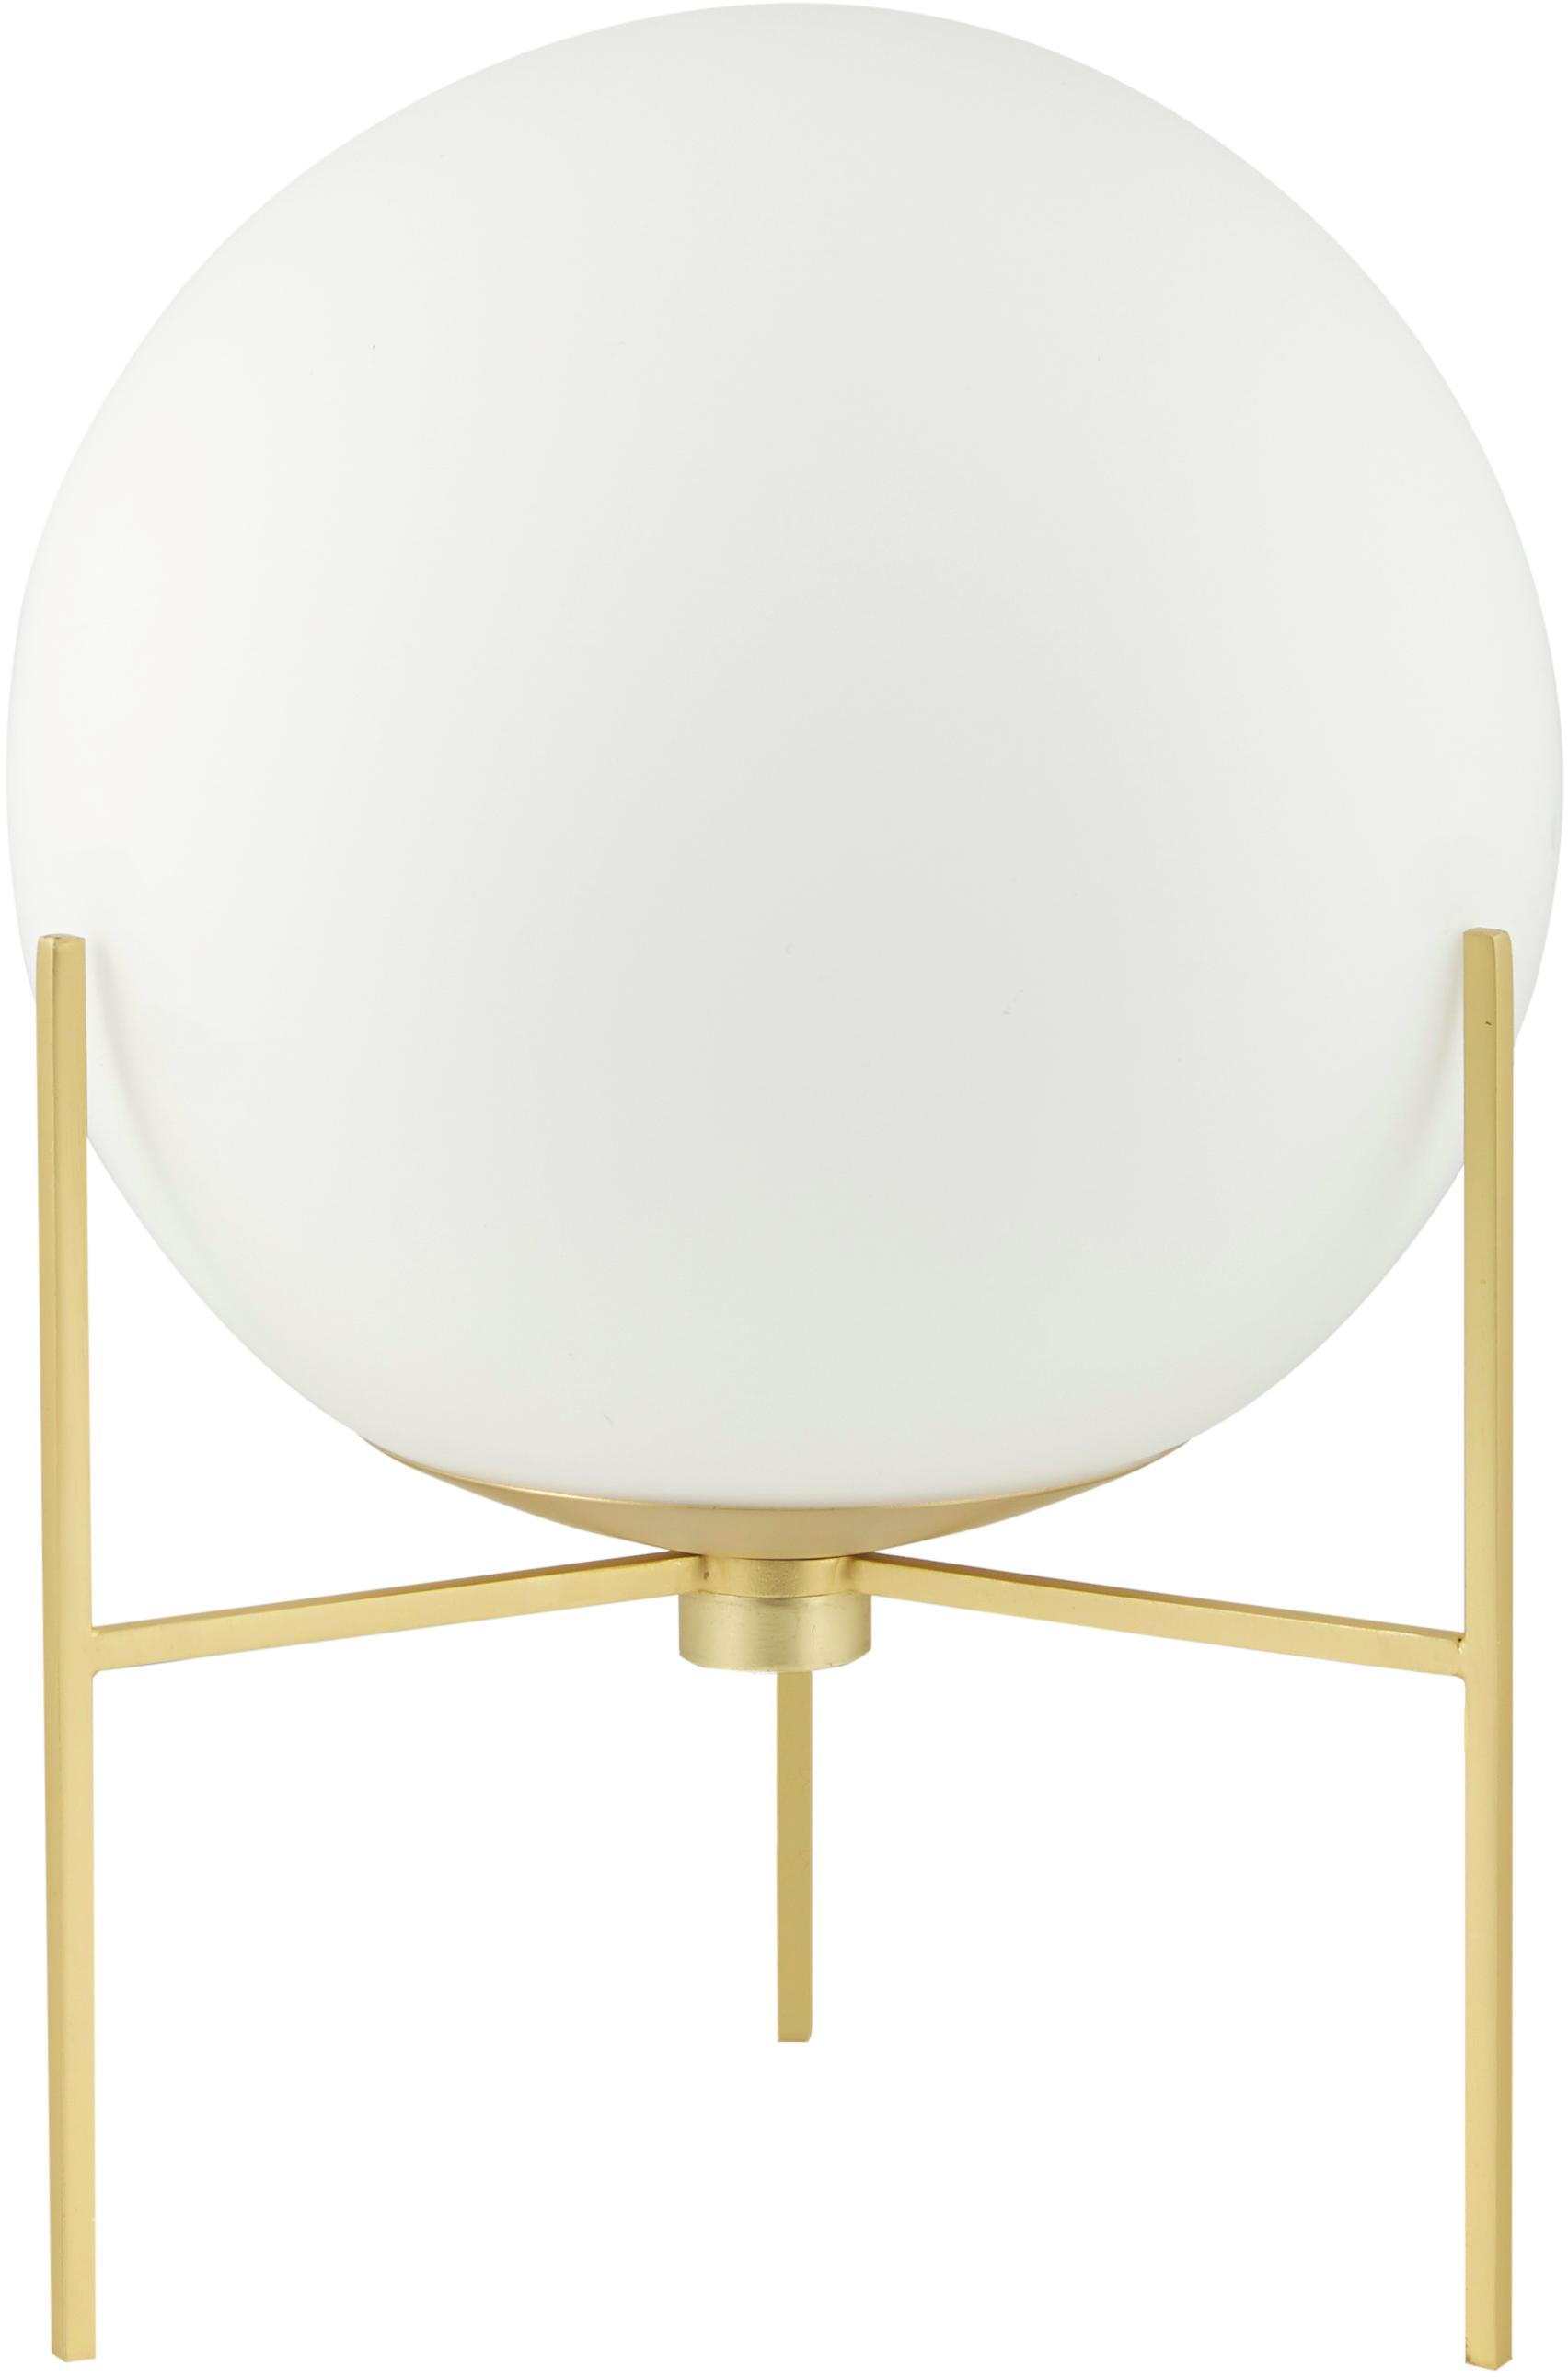 Tischlampe Alton aus Opalglas, Lampenschirm: Opalglas, Messing, Weiss, Ø 20 x H 29 cm